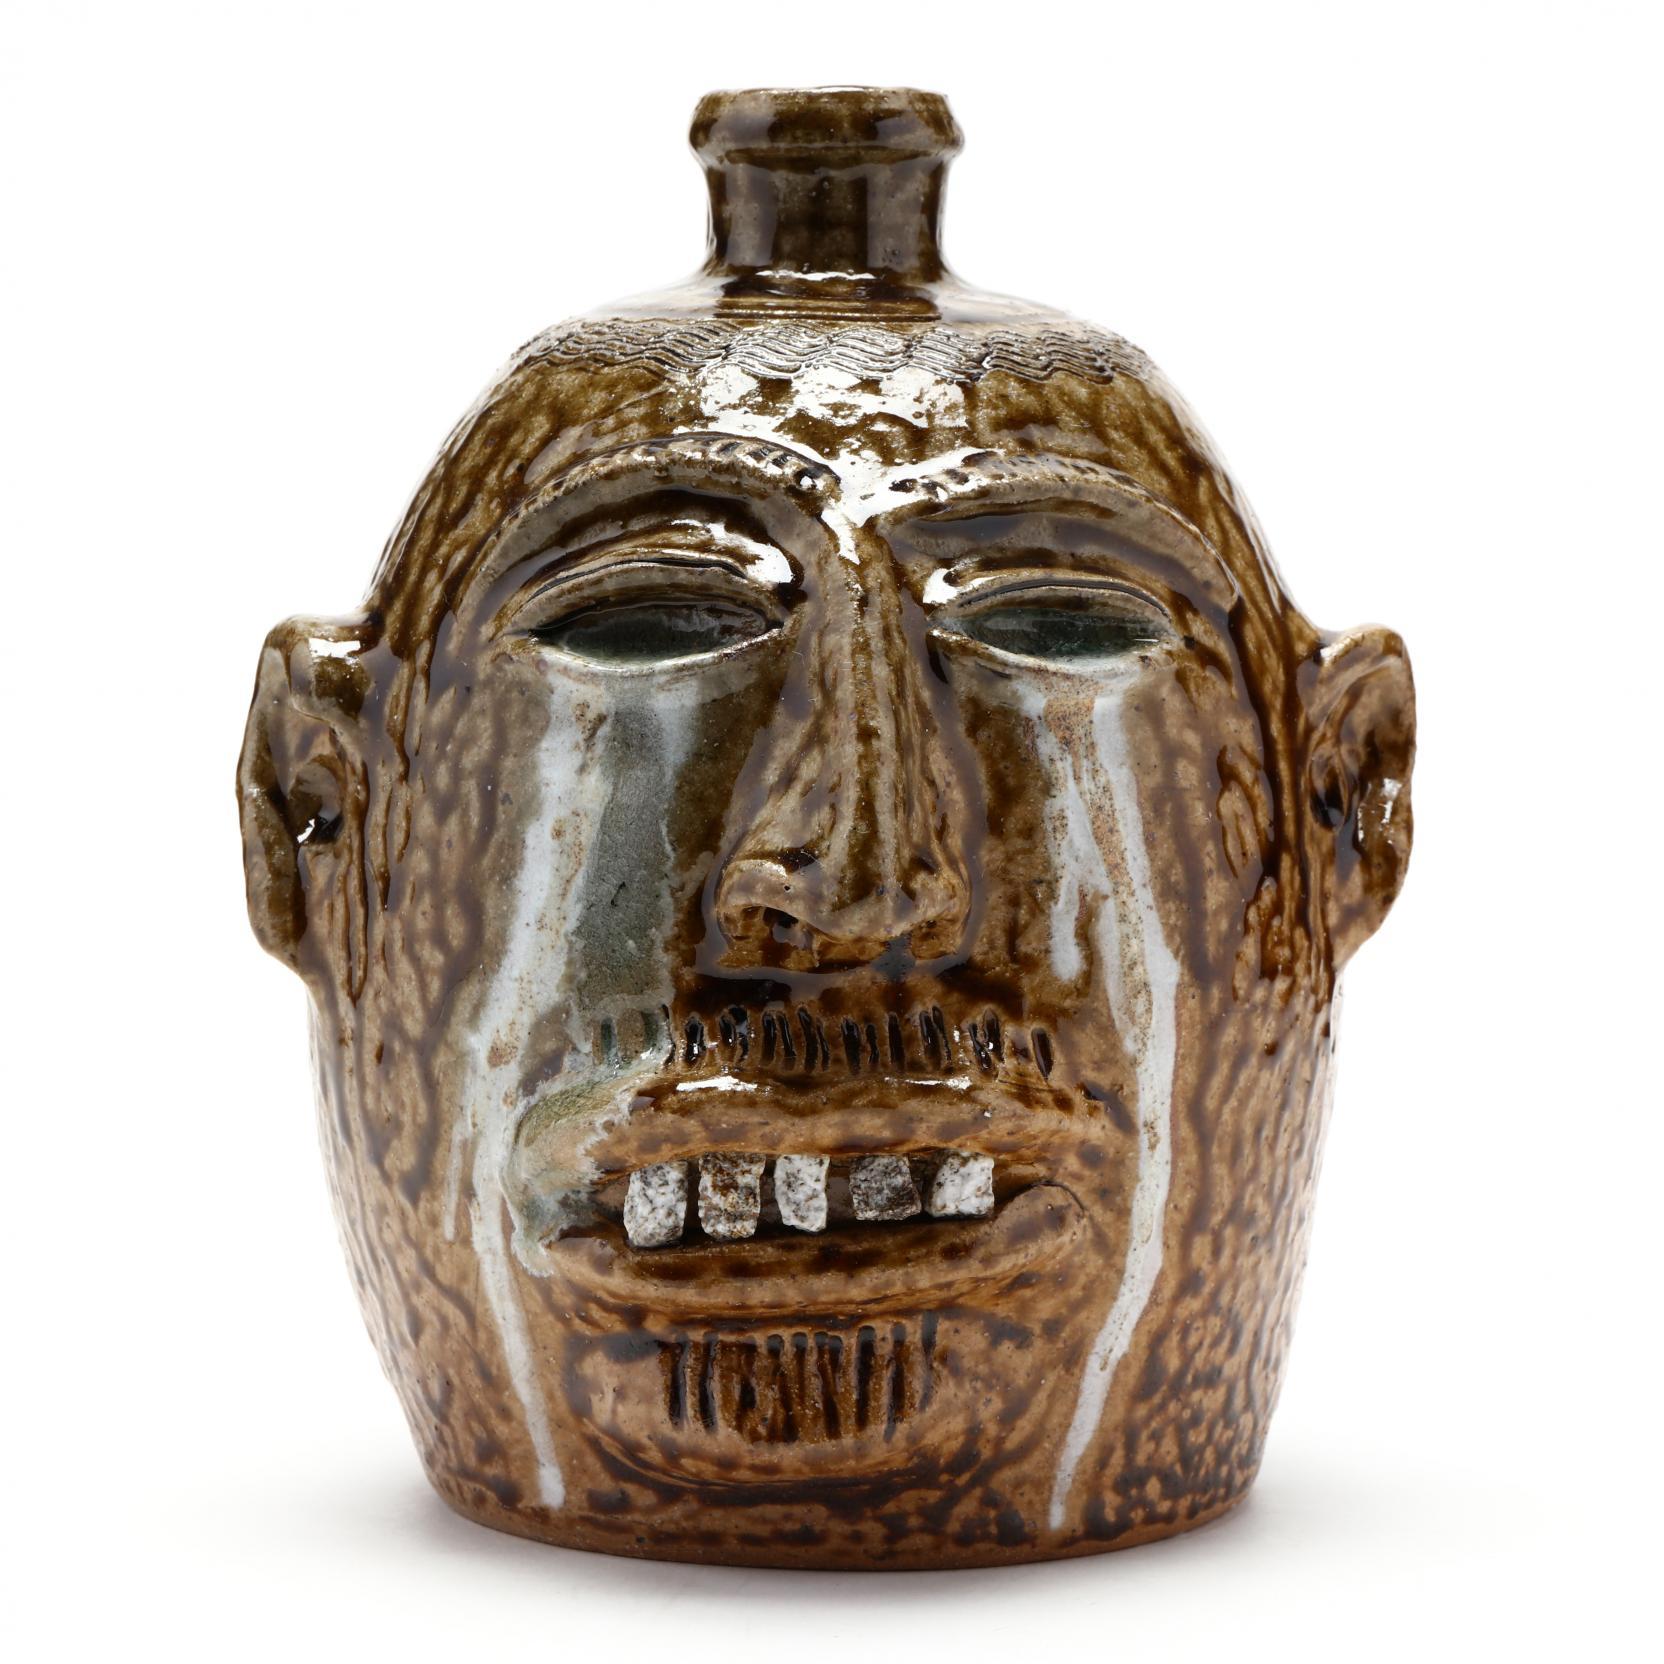 nc-folk-pottery-billy-ray-hussey-runny-eye-face-jug